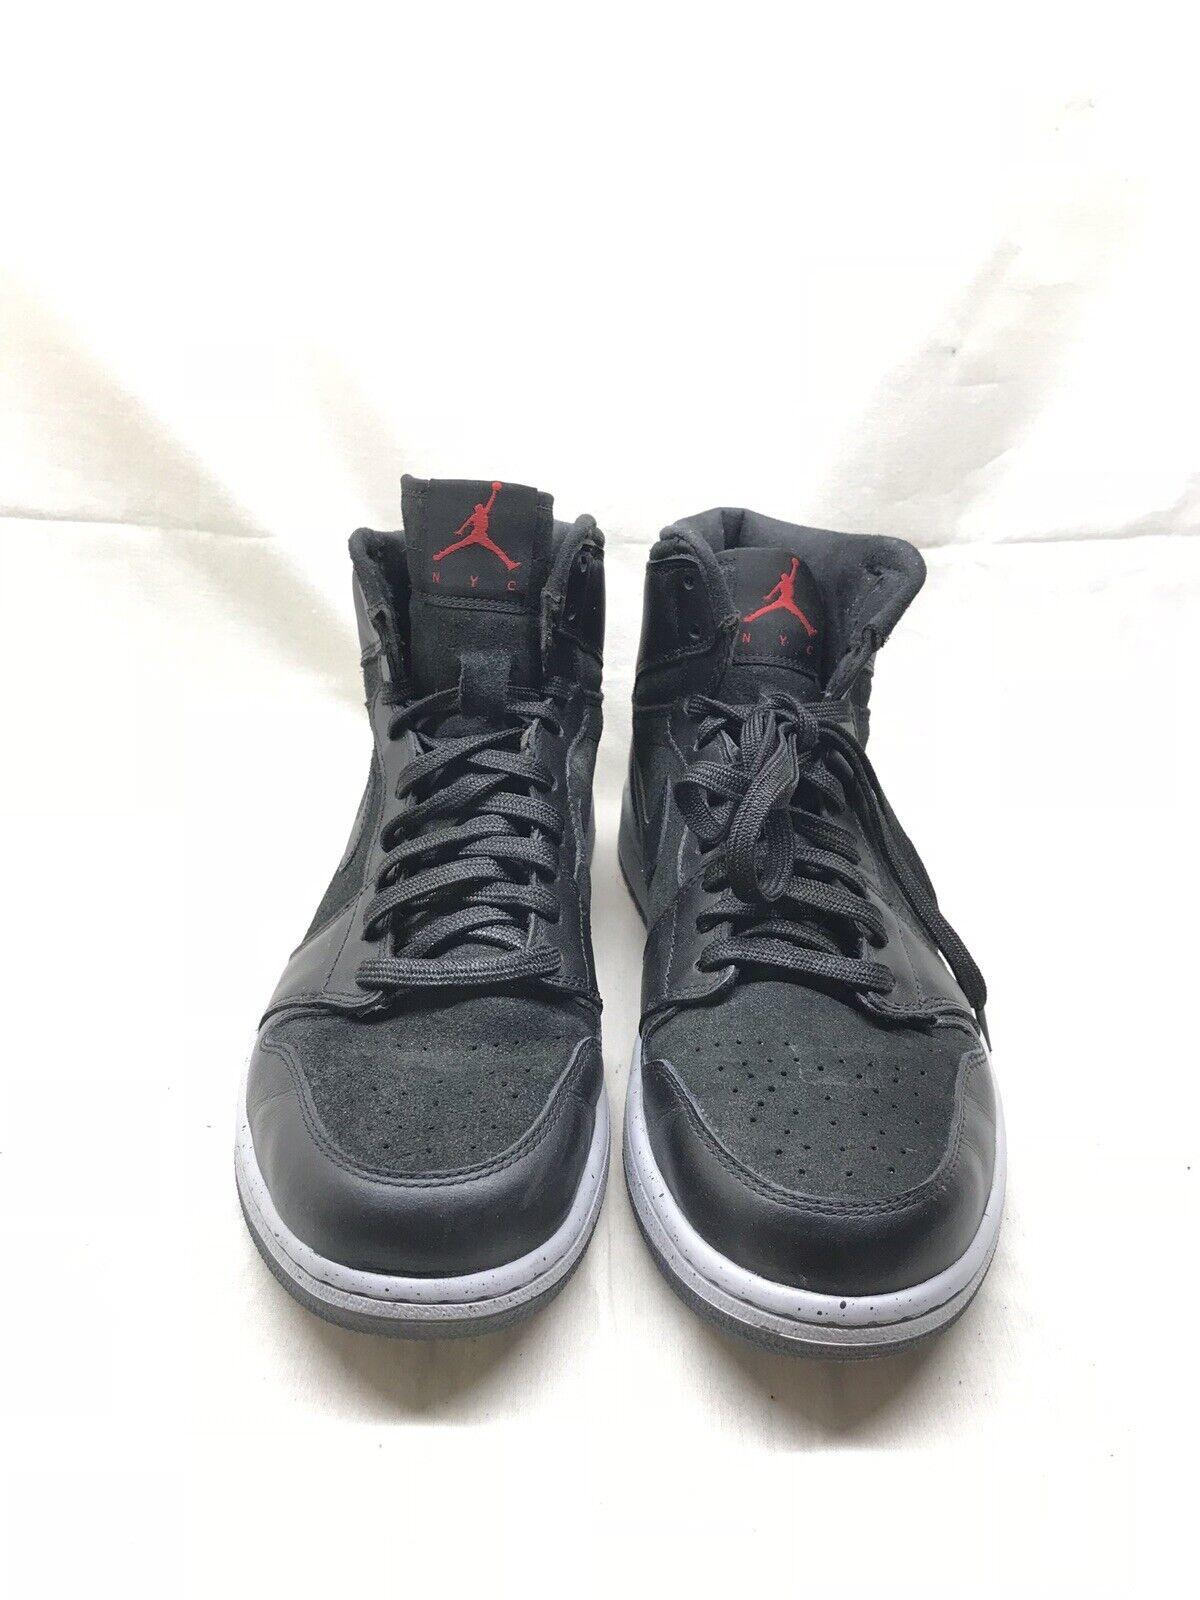 b161245ad1 Nike Air Jordan 1 Retro High NYC 23NY Black Red Wold Grey Size 11 Lightly  Worn